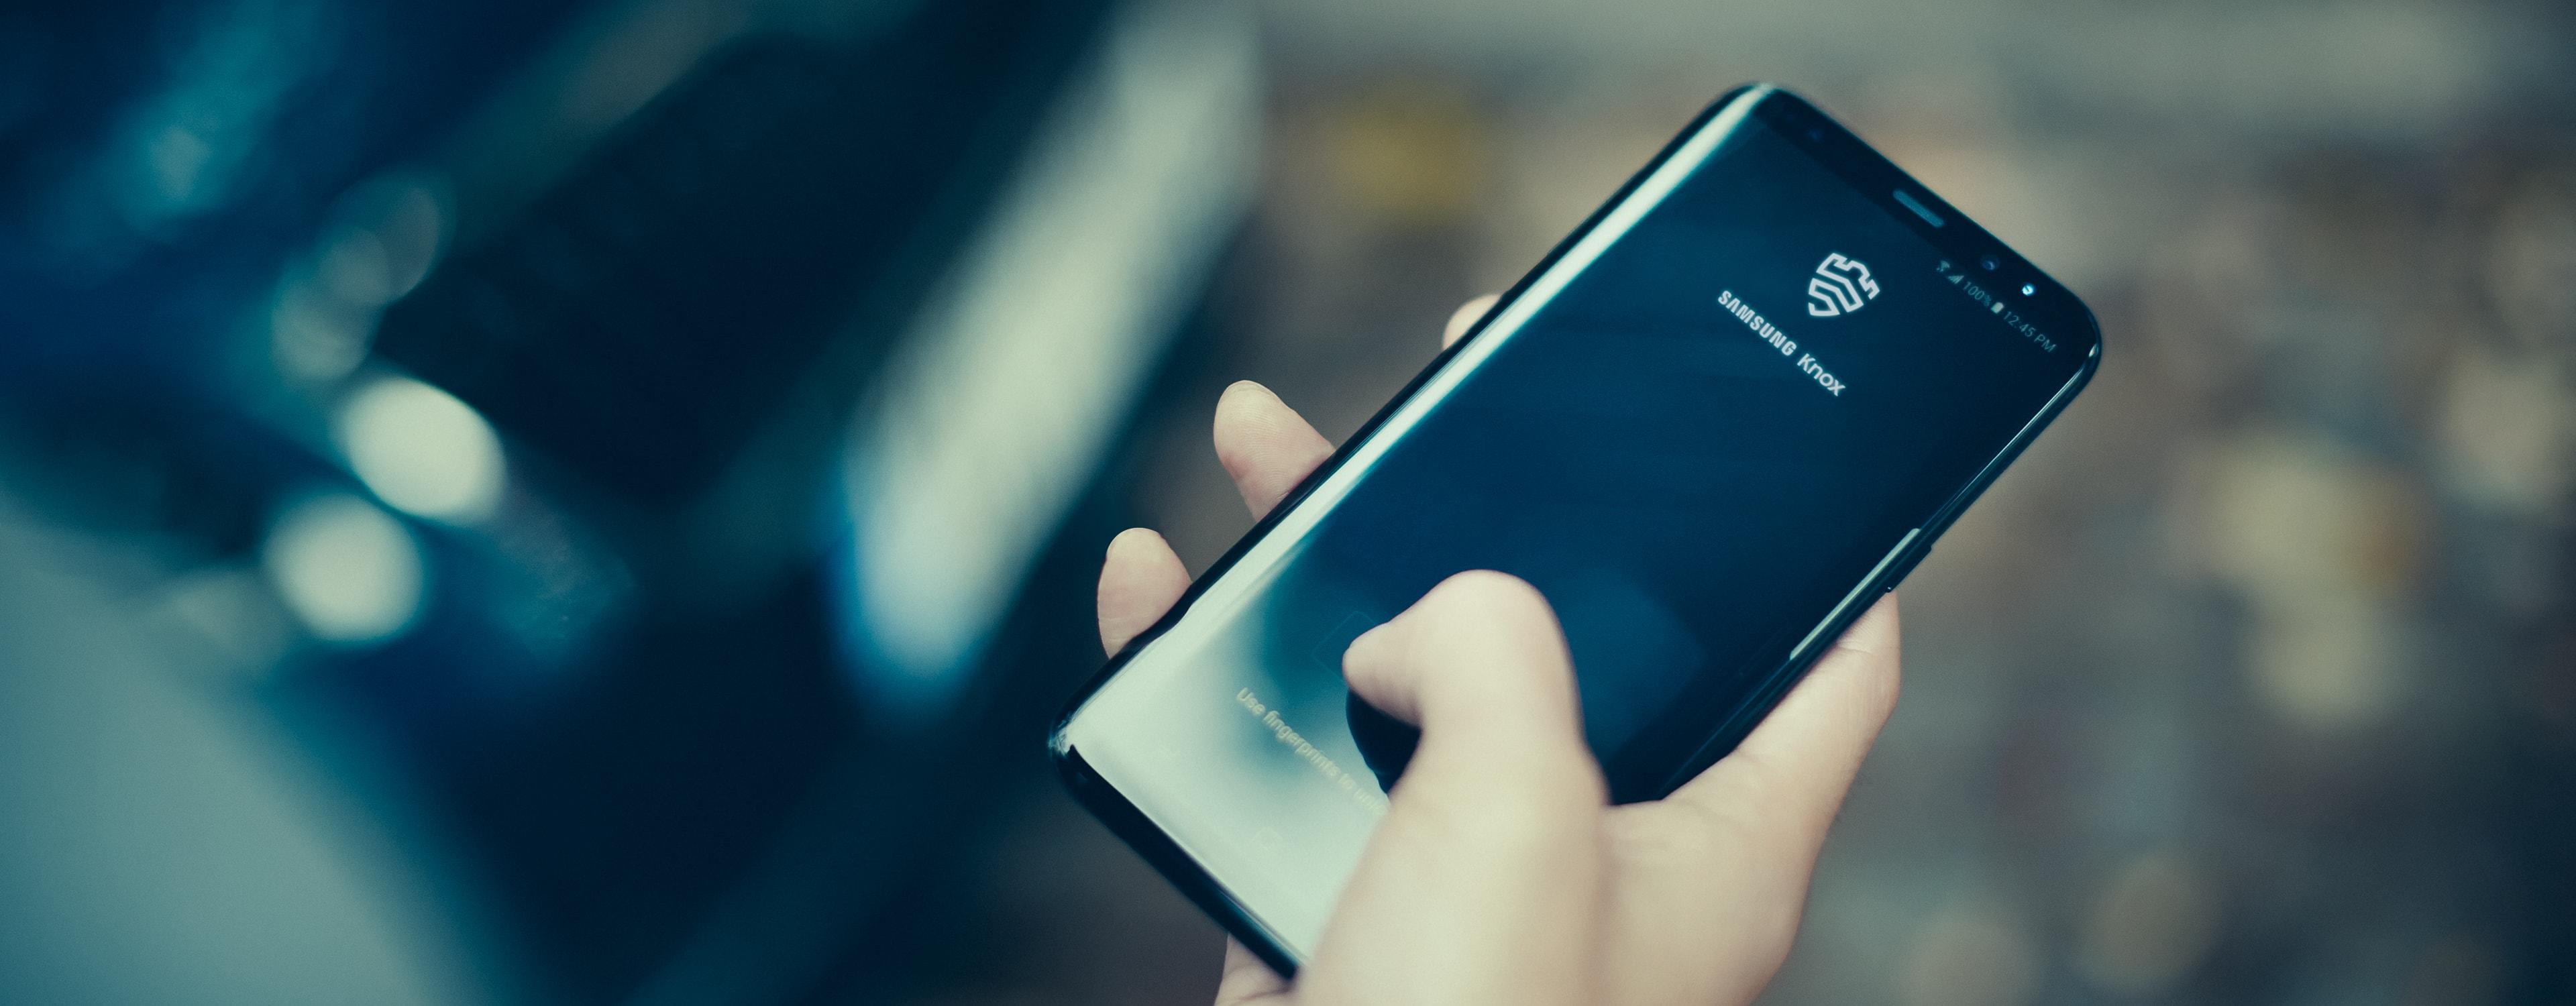 Knox Platform for Enterprise | Advanced mobile security